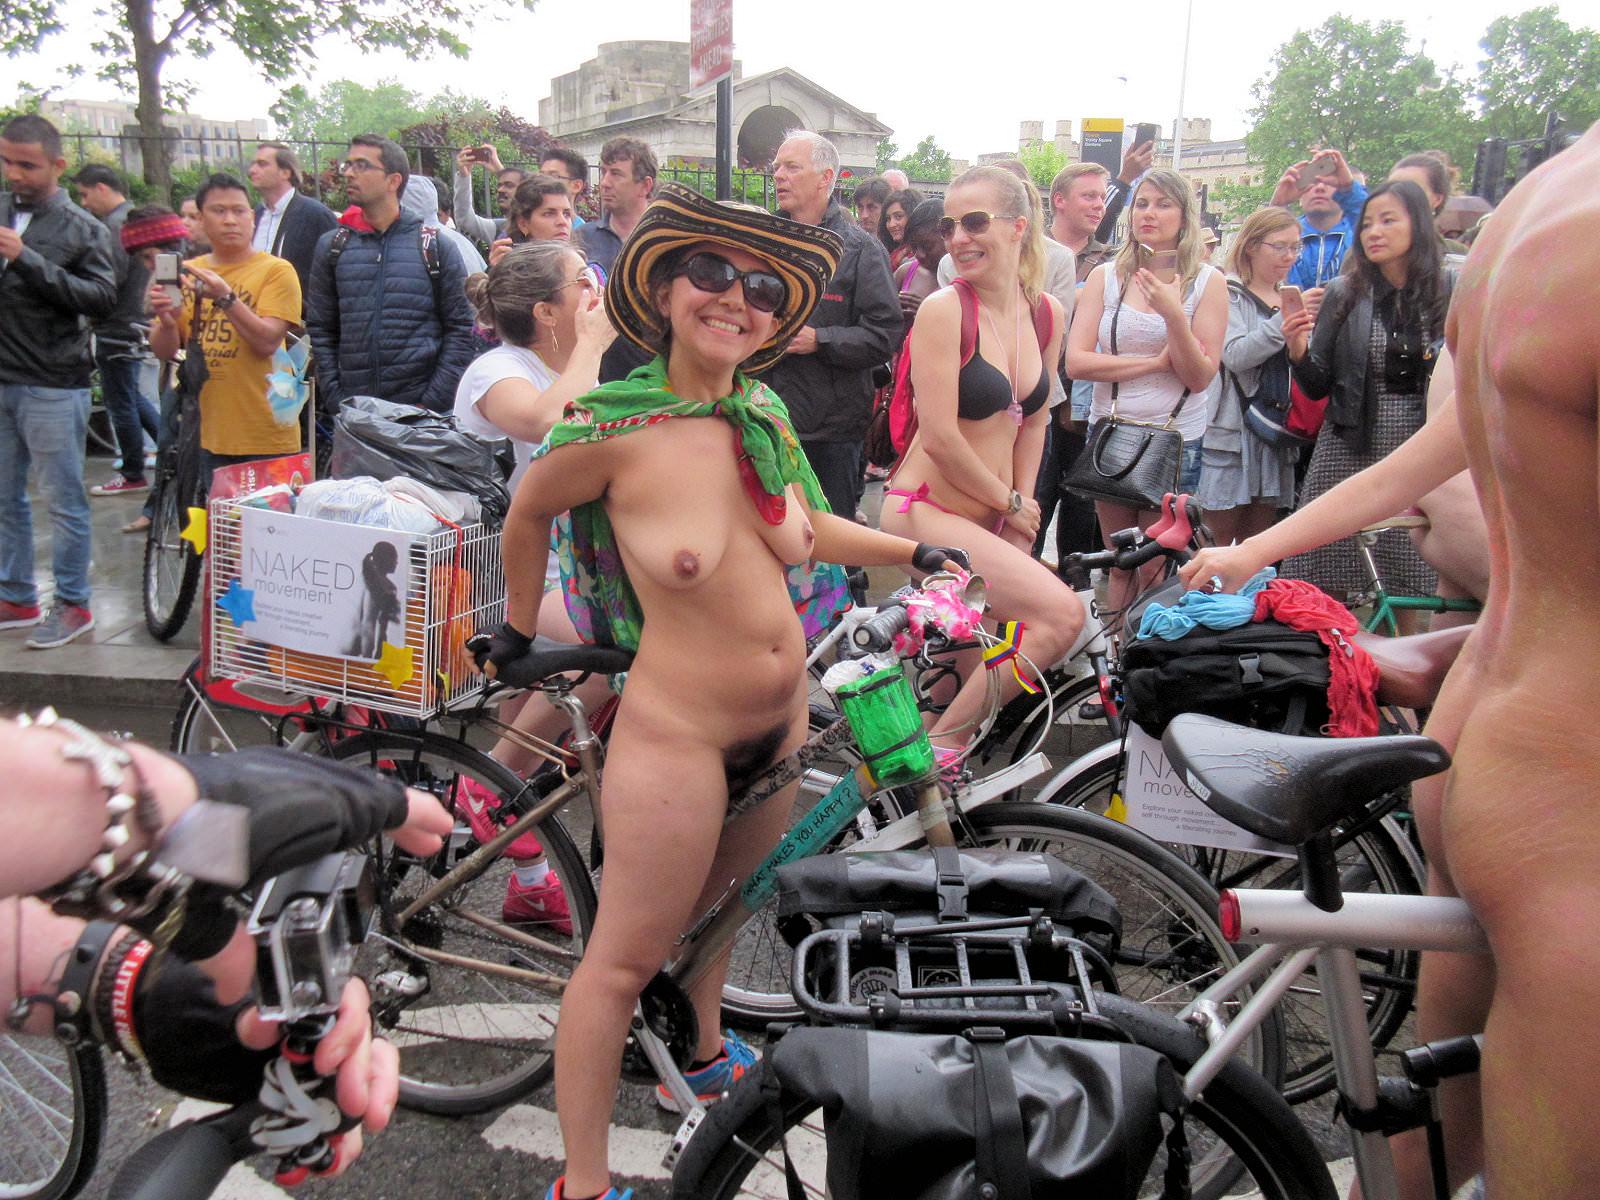 World Naked Bike Ride London Hundre Nude2011-6171